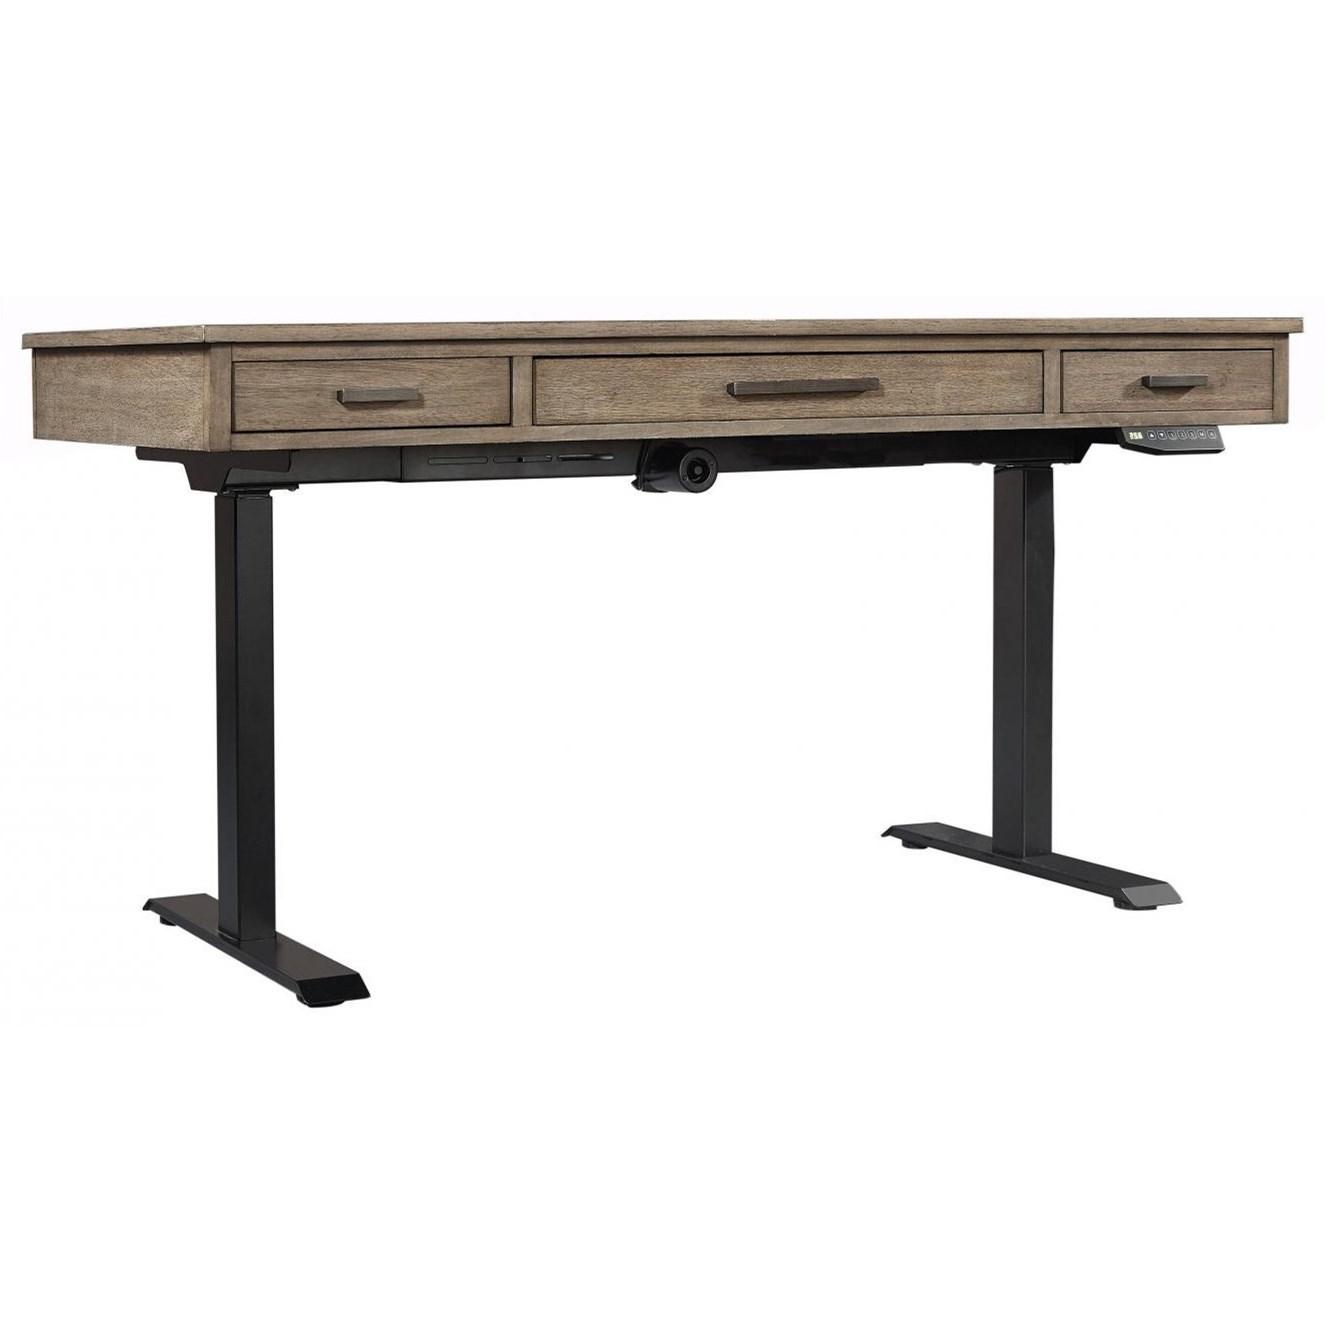 Trellis Lift-Top Desk by Aspenhome at Walker's Furniture